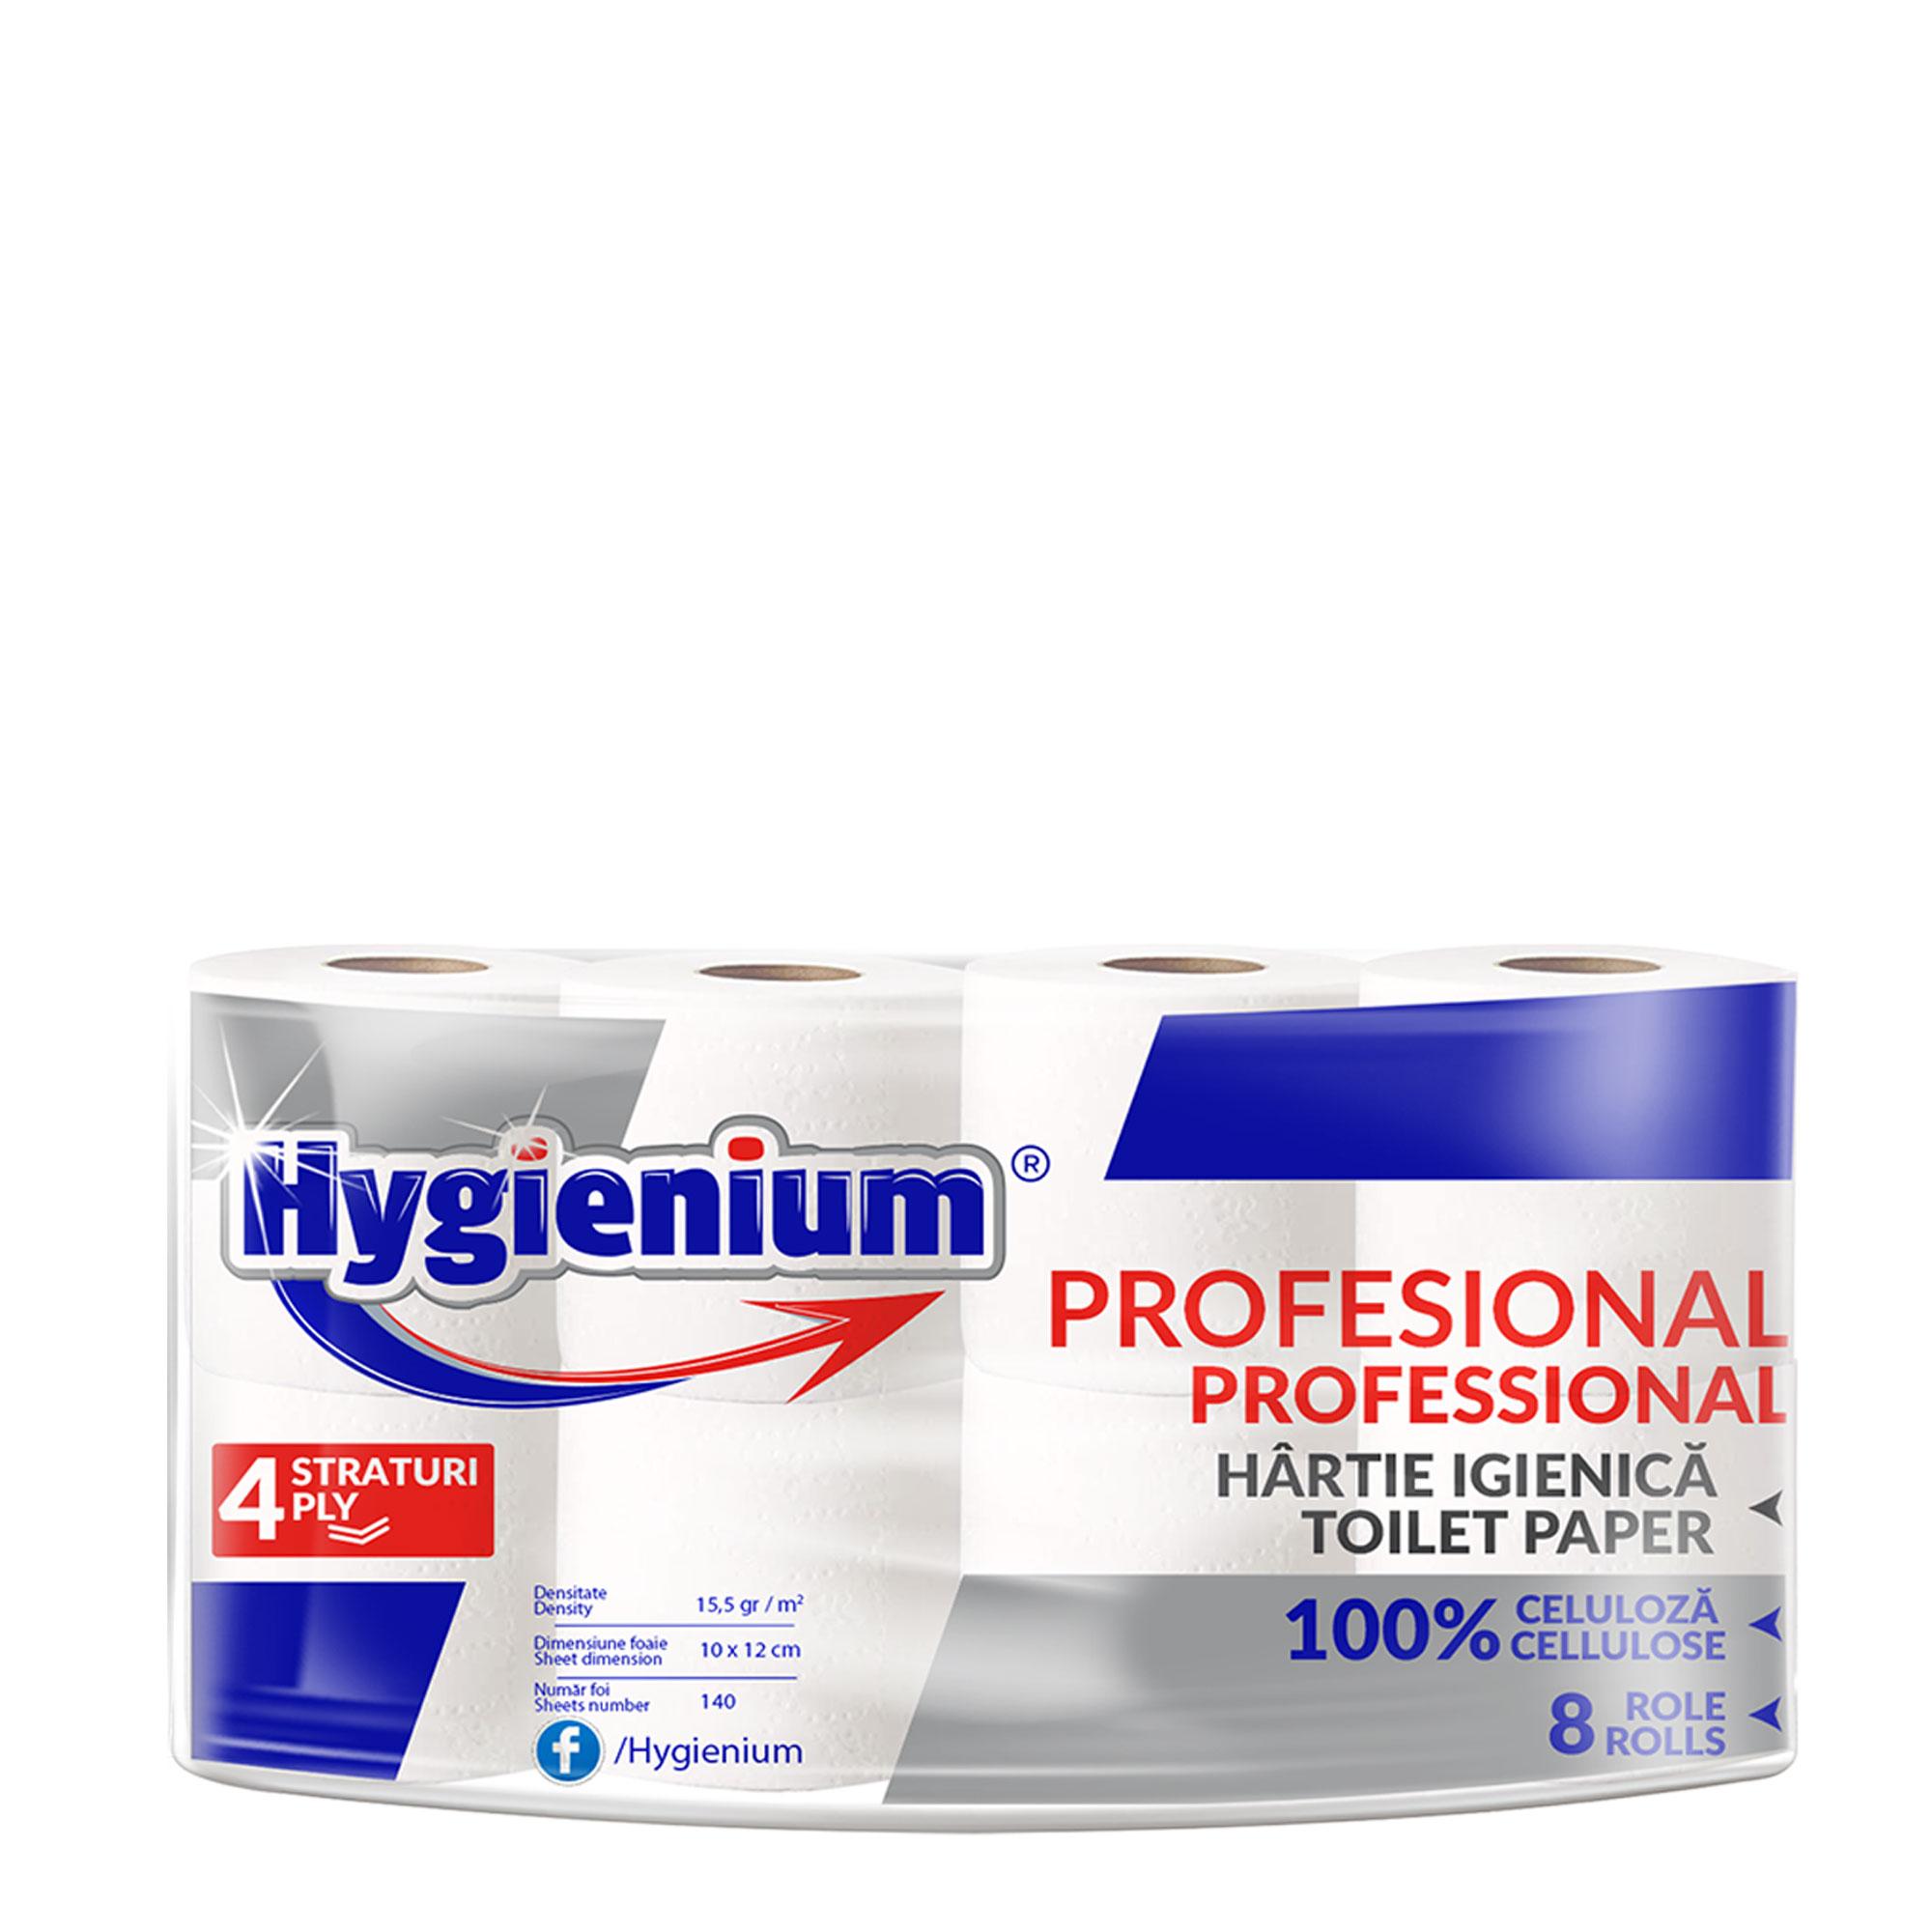 Hygienium Professional Hartie Igienica 8 rolls